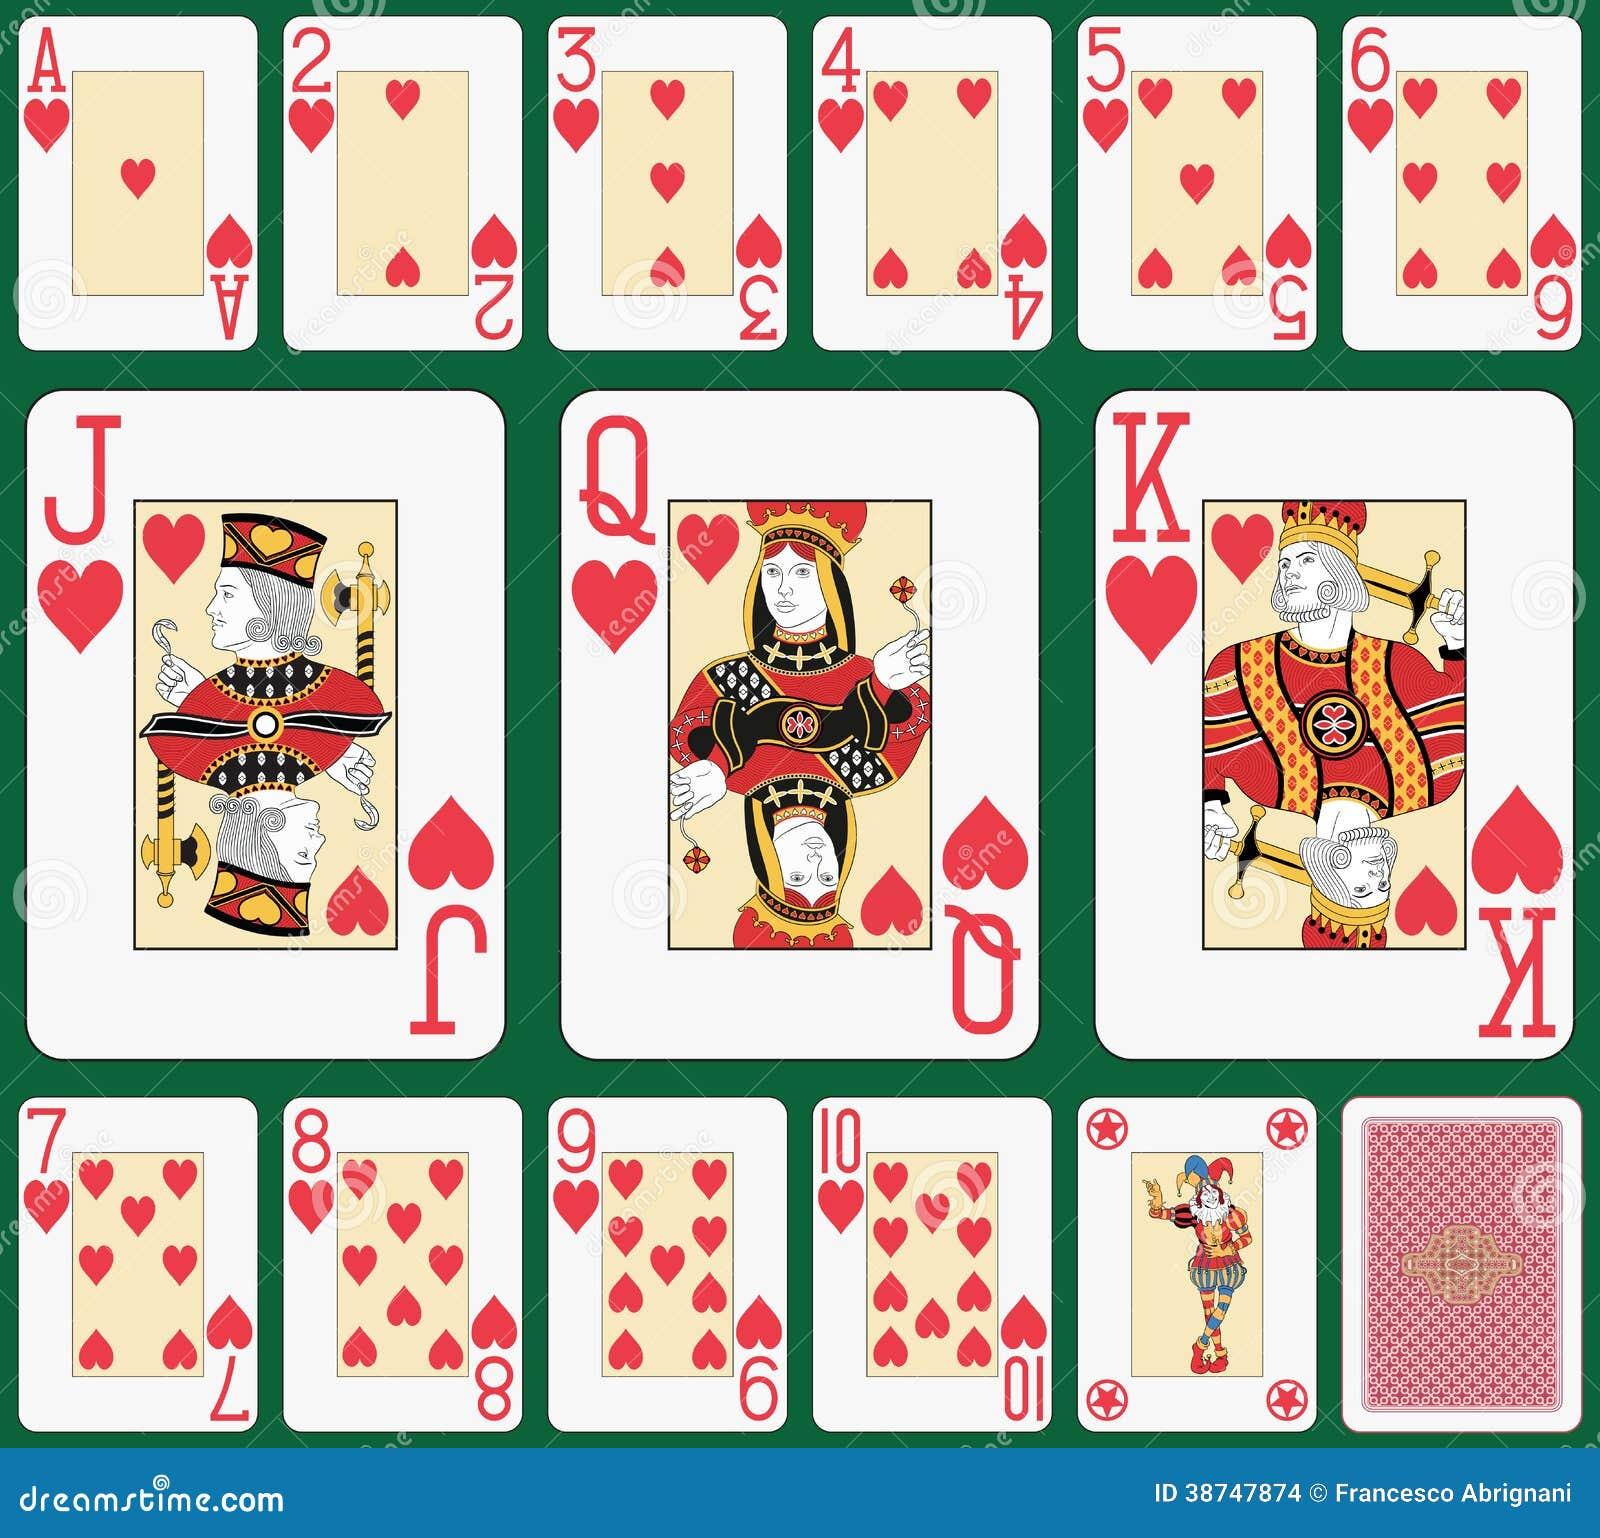 Blackjack Heart suit large index